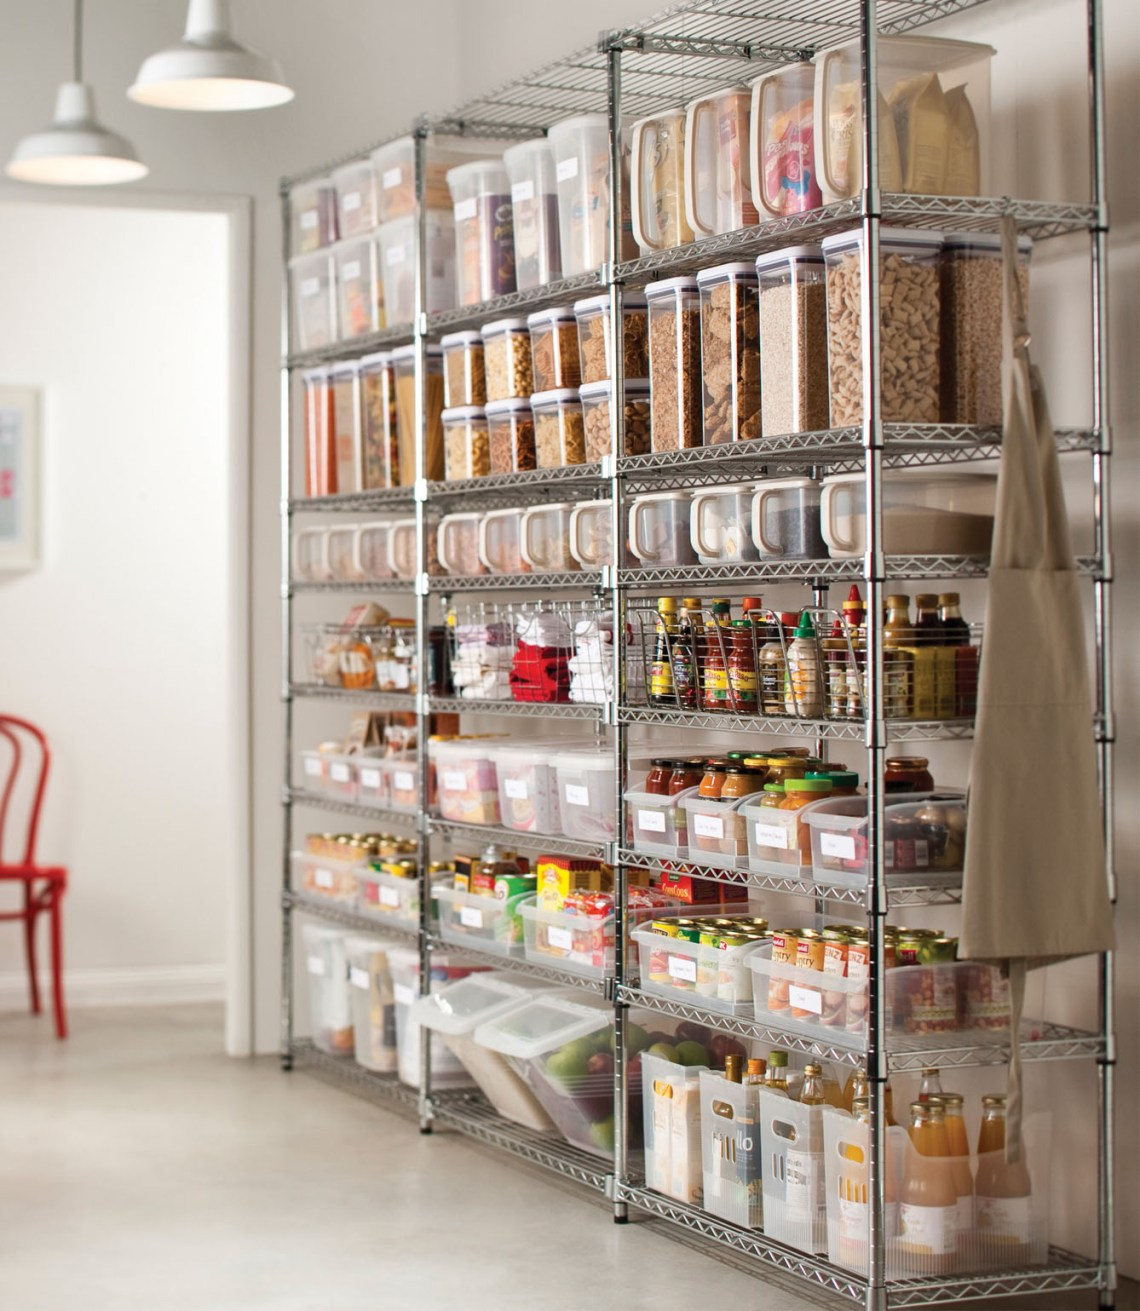 Image Result For Best Cupcake Design Kitchen Accessories